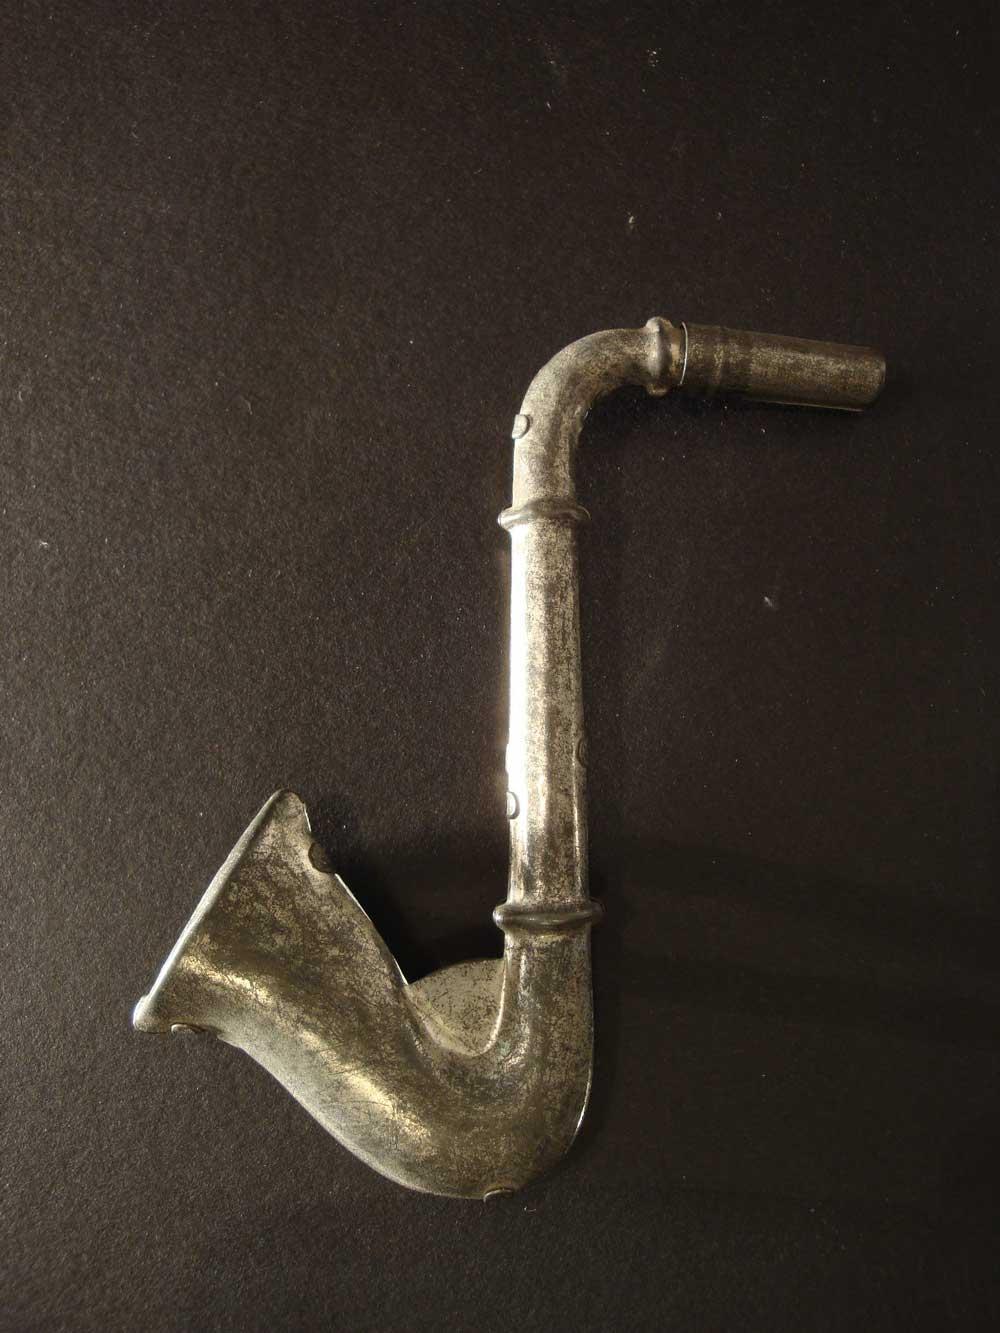 saxophone-shaped, 1940 New York World's Fair, souvenir, collectible,